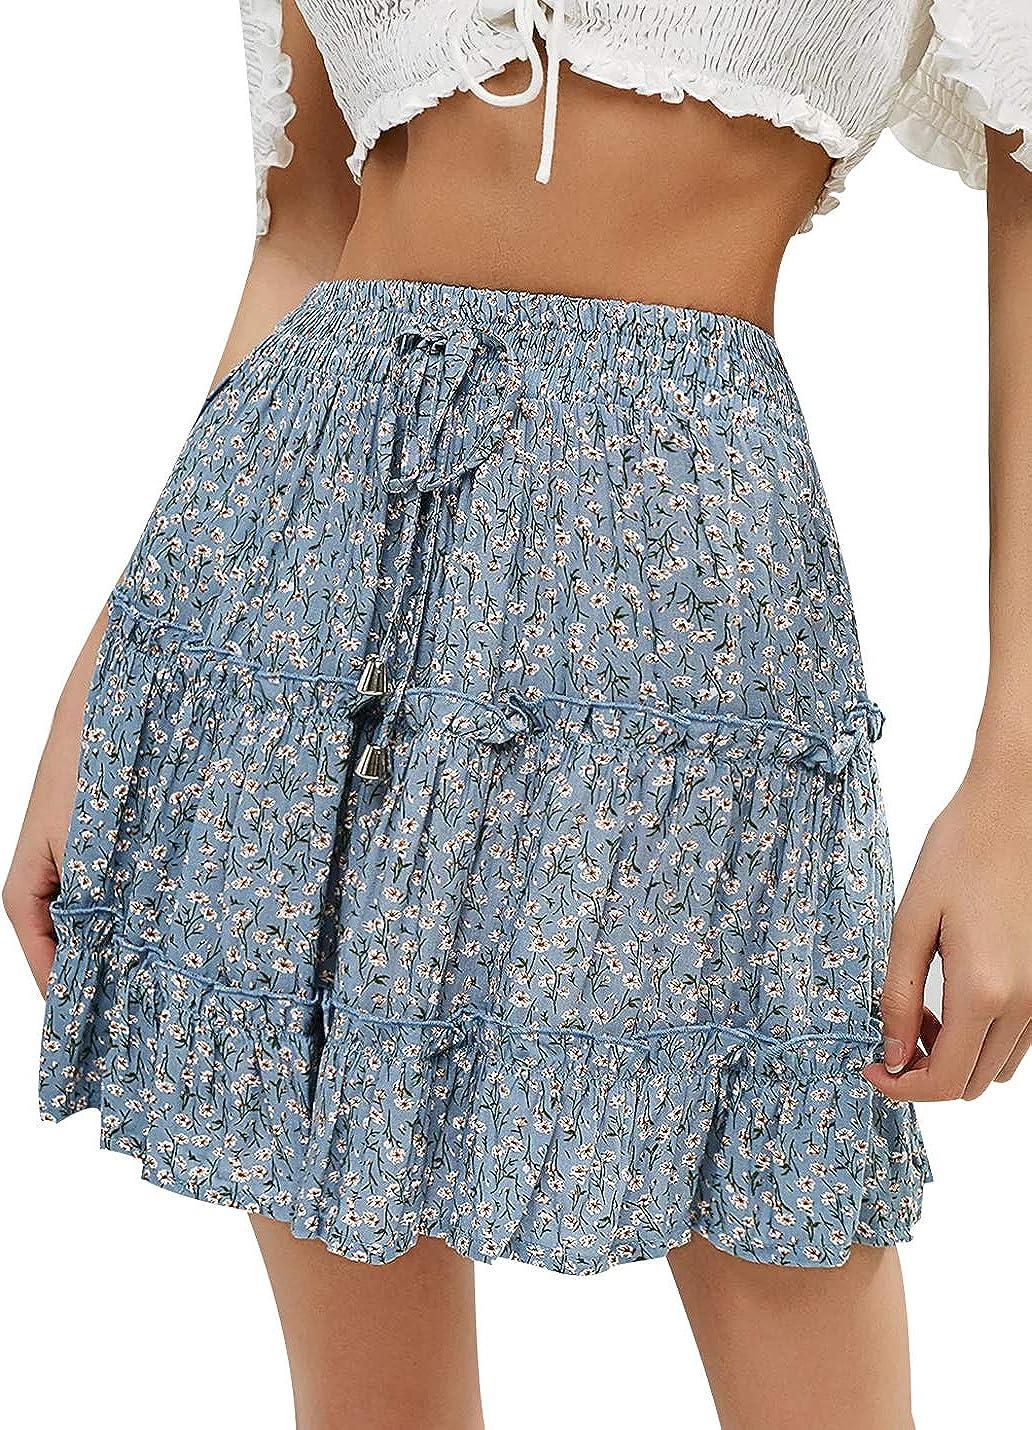 UANEO Womens Summer Floral Print Elastic High Waist Ruffle Pleated Mini Skirt